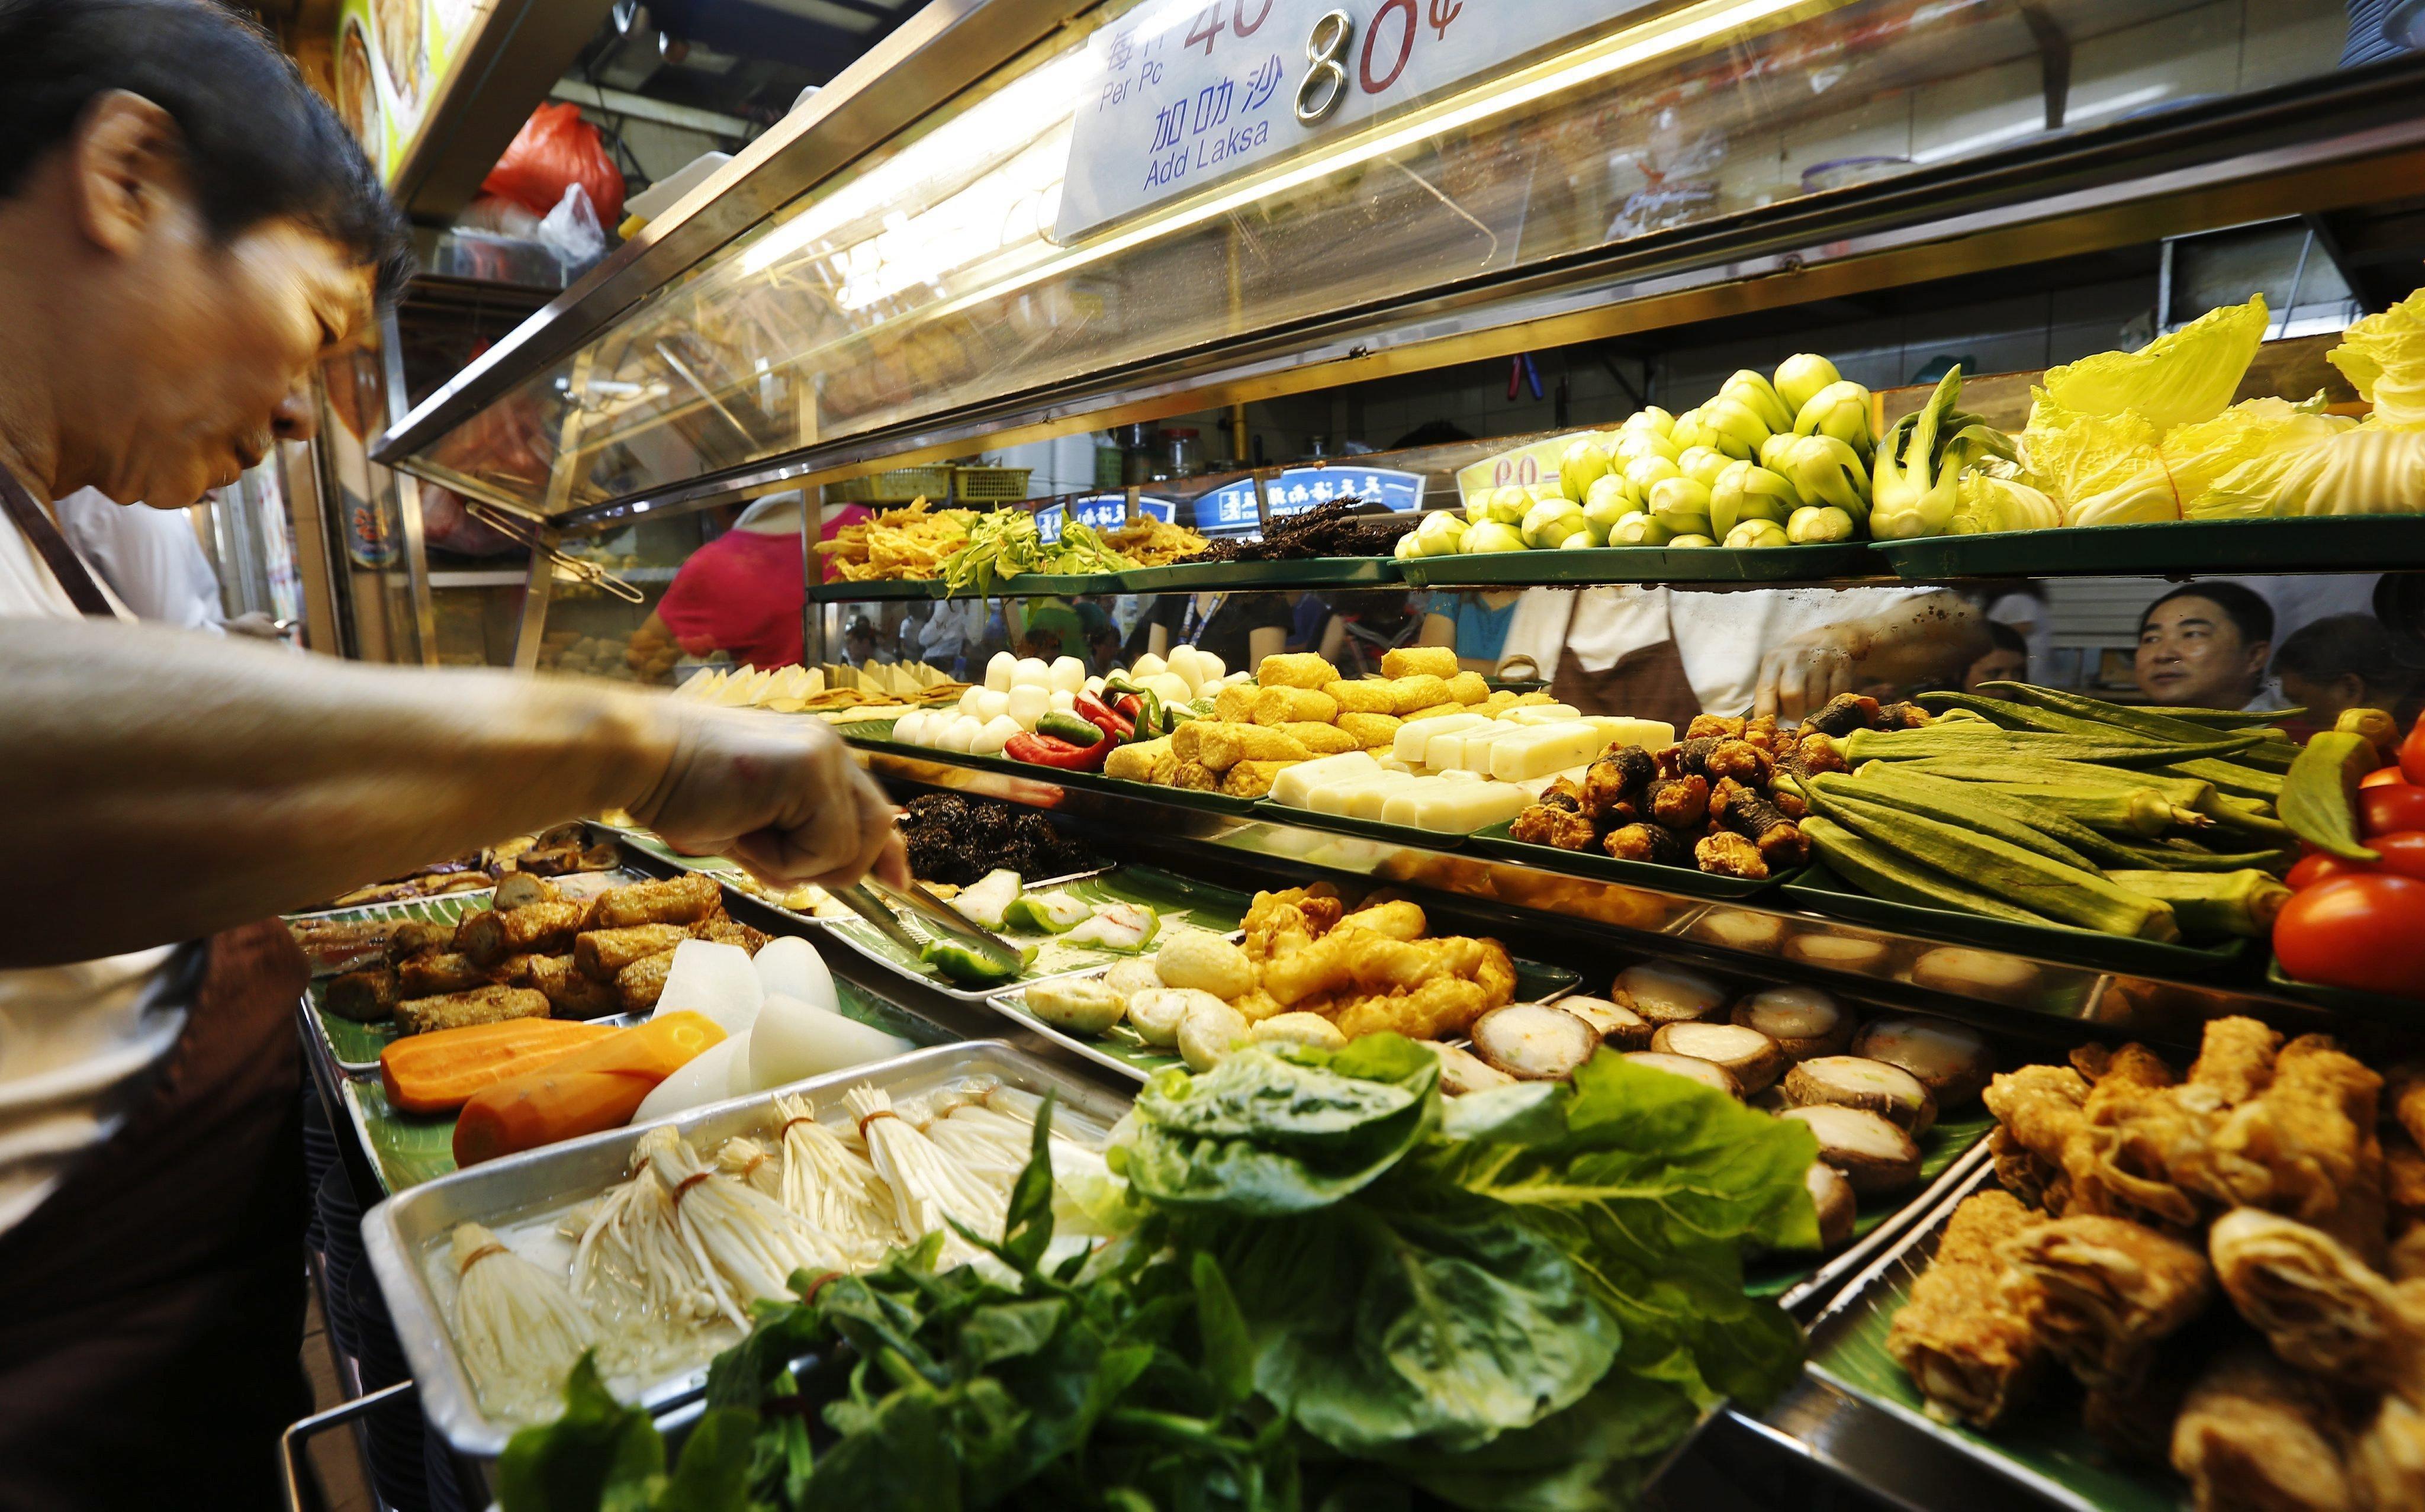 Dieta contra reflujo gastroesofagico